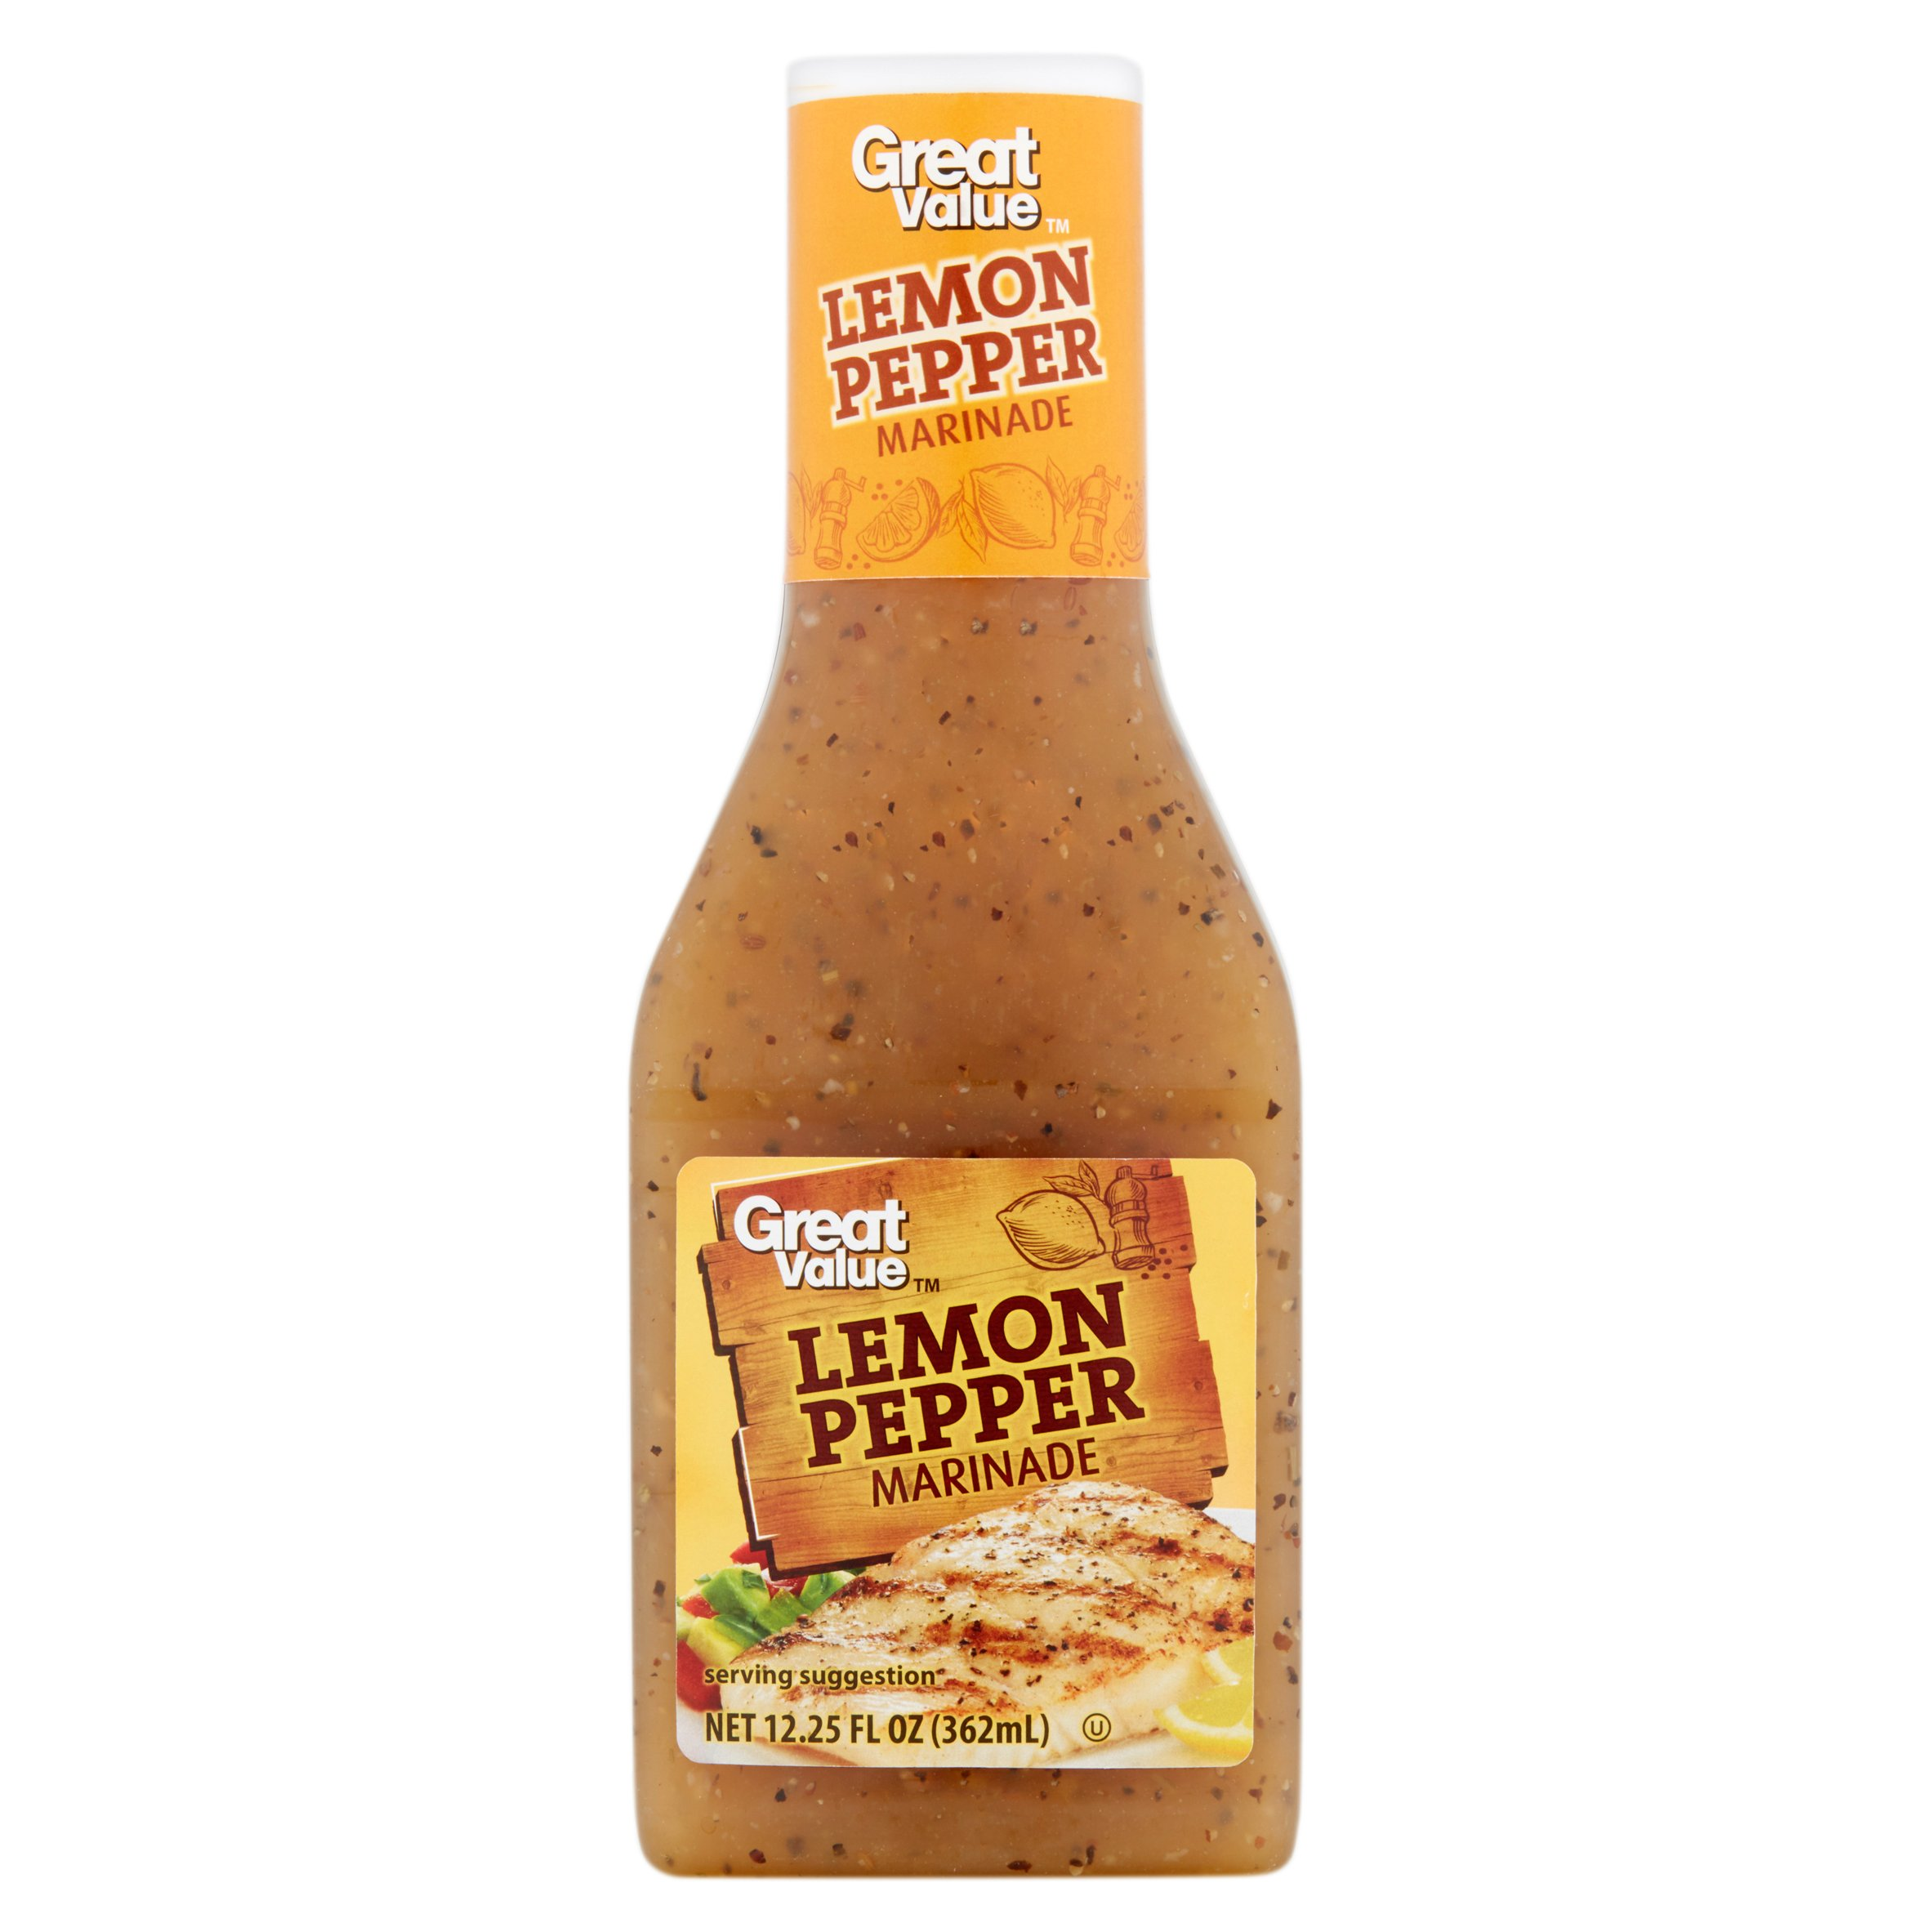 Great Value Lemon Pepper Marinade, 12.25 fl oz